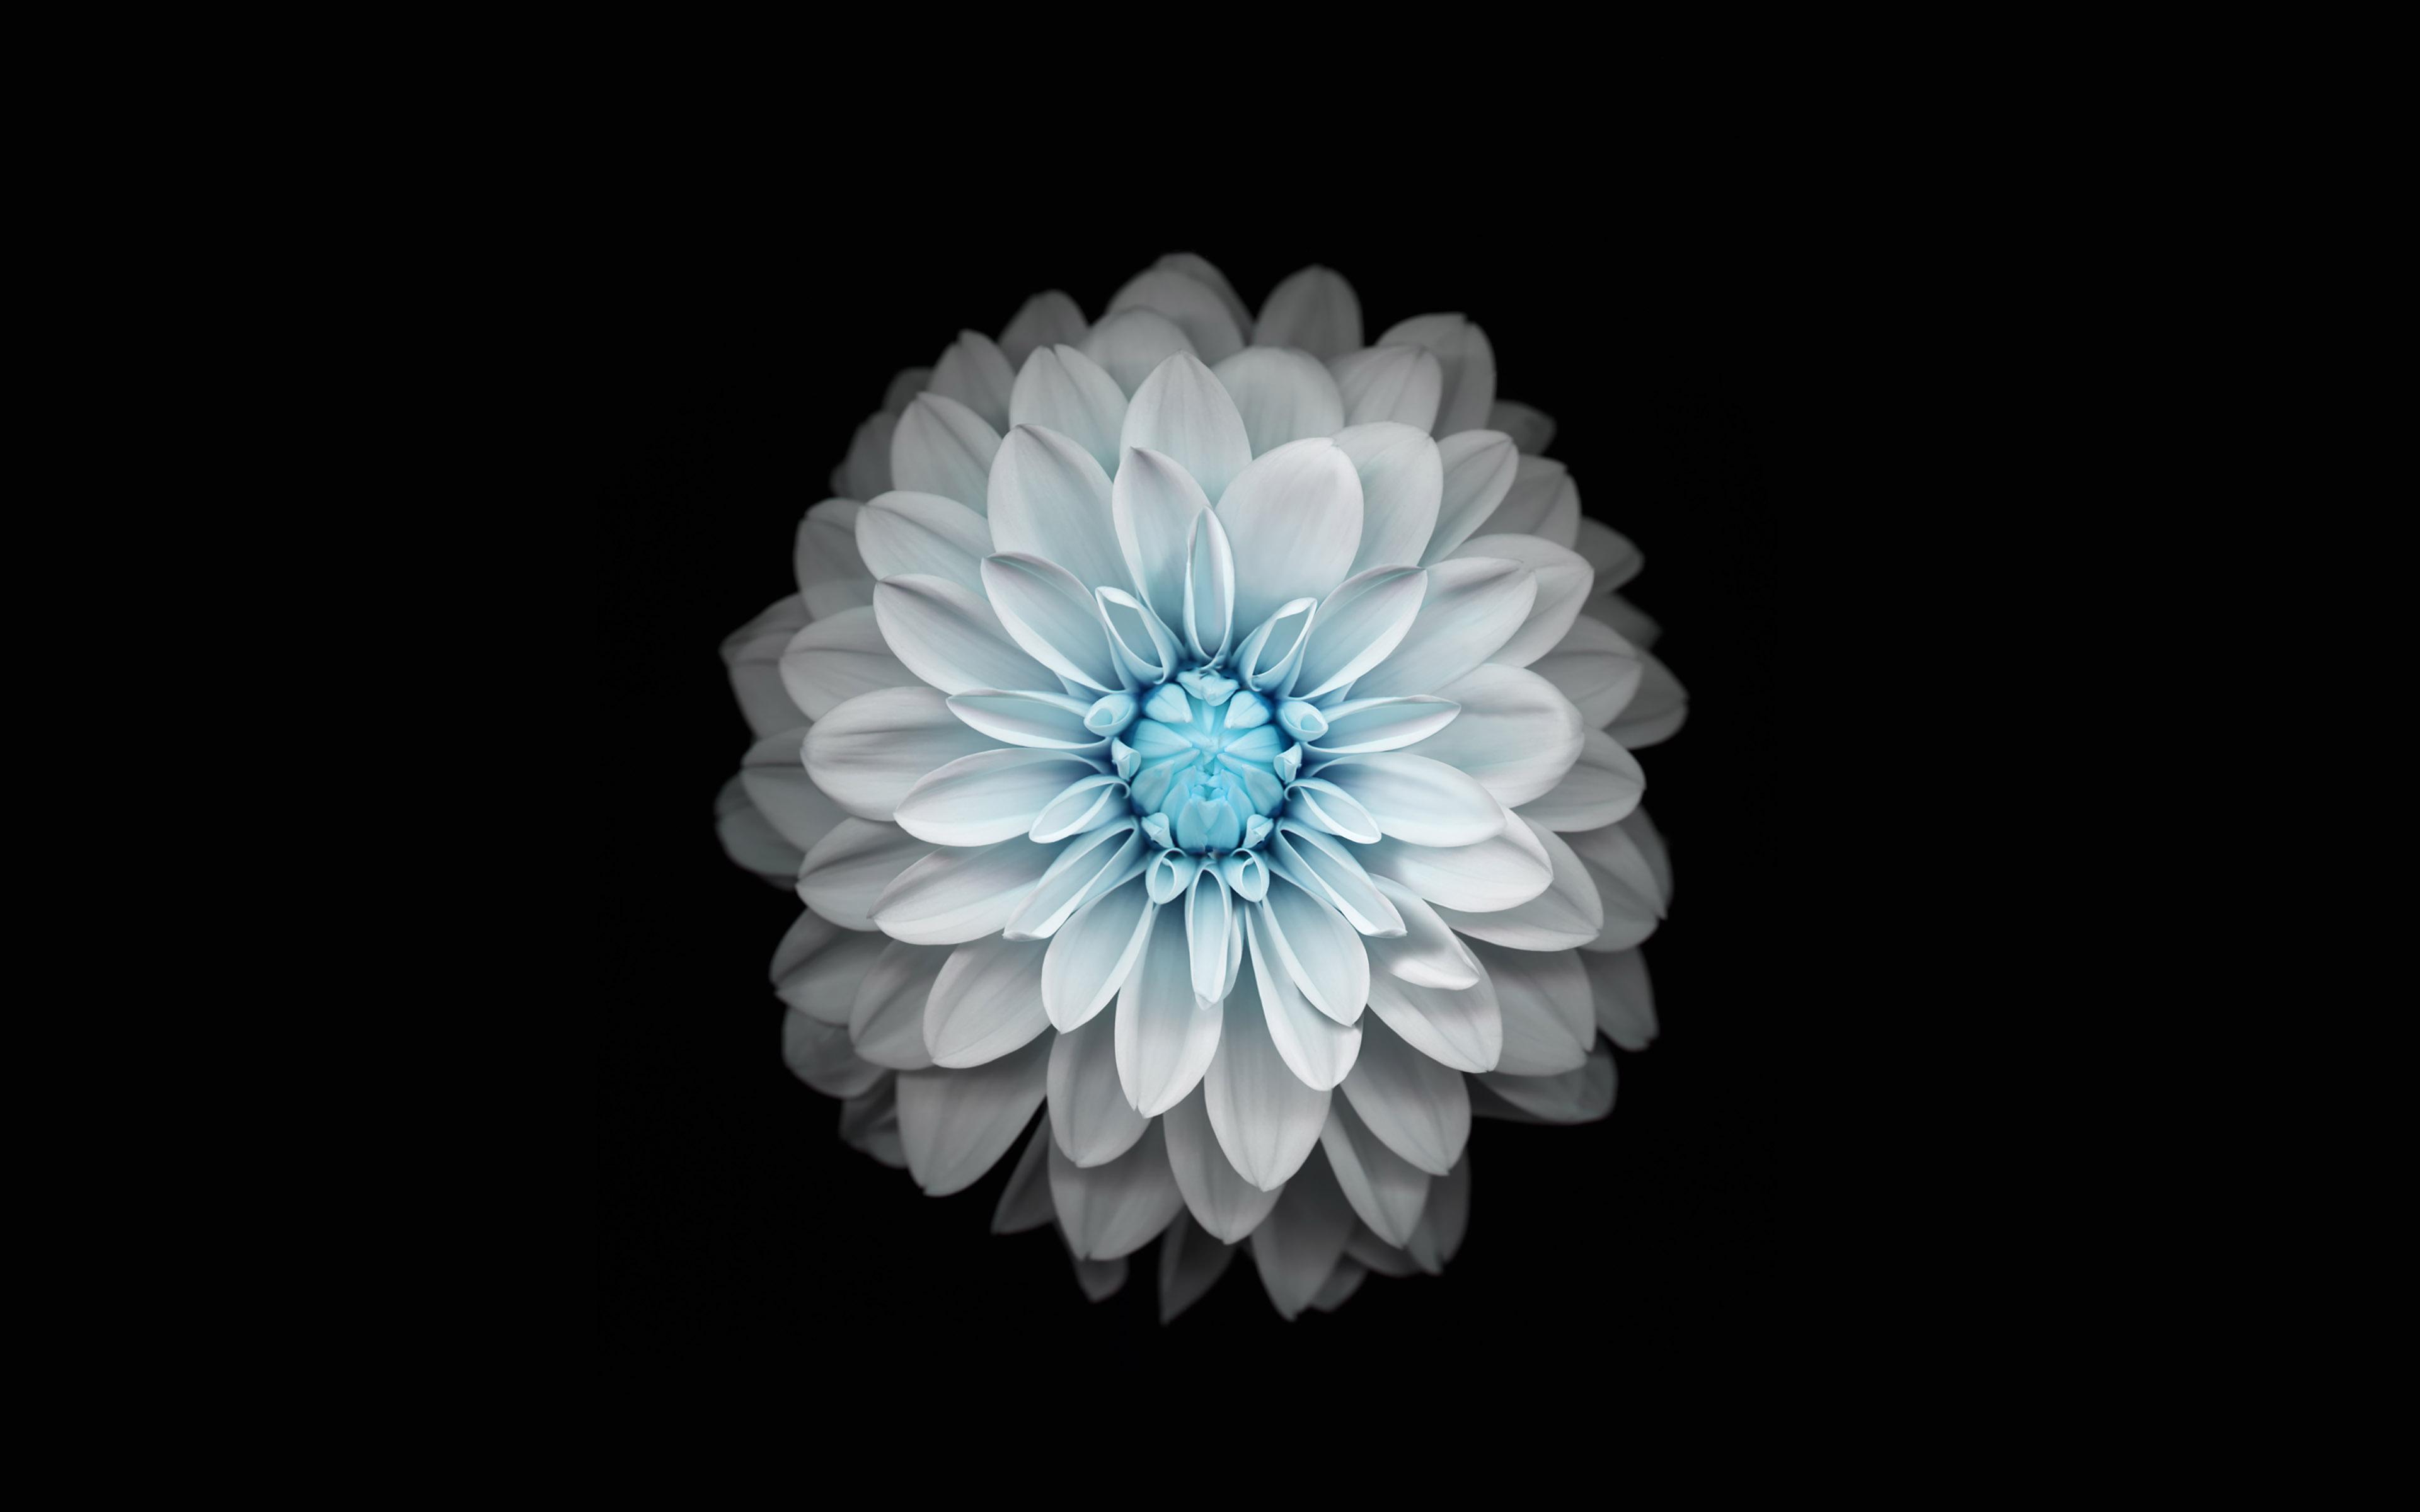 Ac92 Wallpaper Apple Iphone6 Plus Ios8 Flower Blue Wallpaper